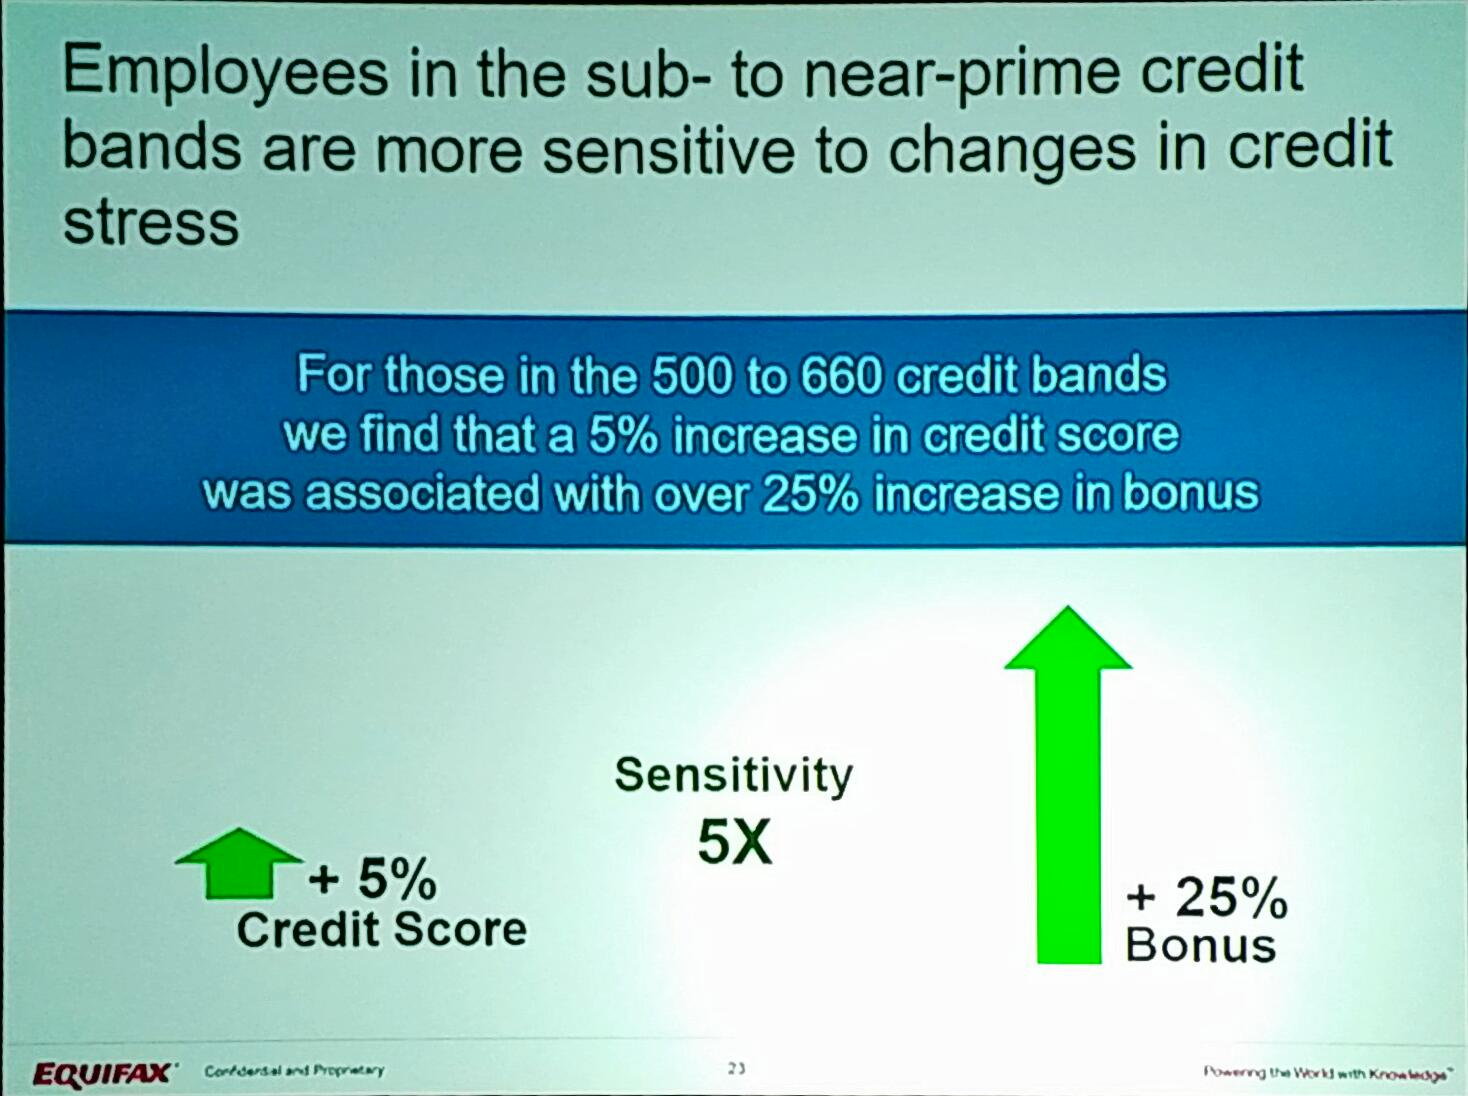 No surprise -  better credit scores who improve get even more likely a higher bonus #EFXForum17 https://t.co/FEKNbnEoDA